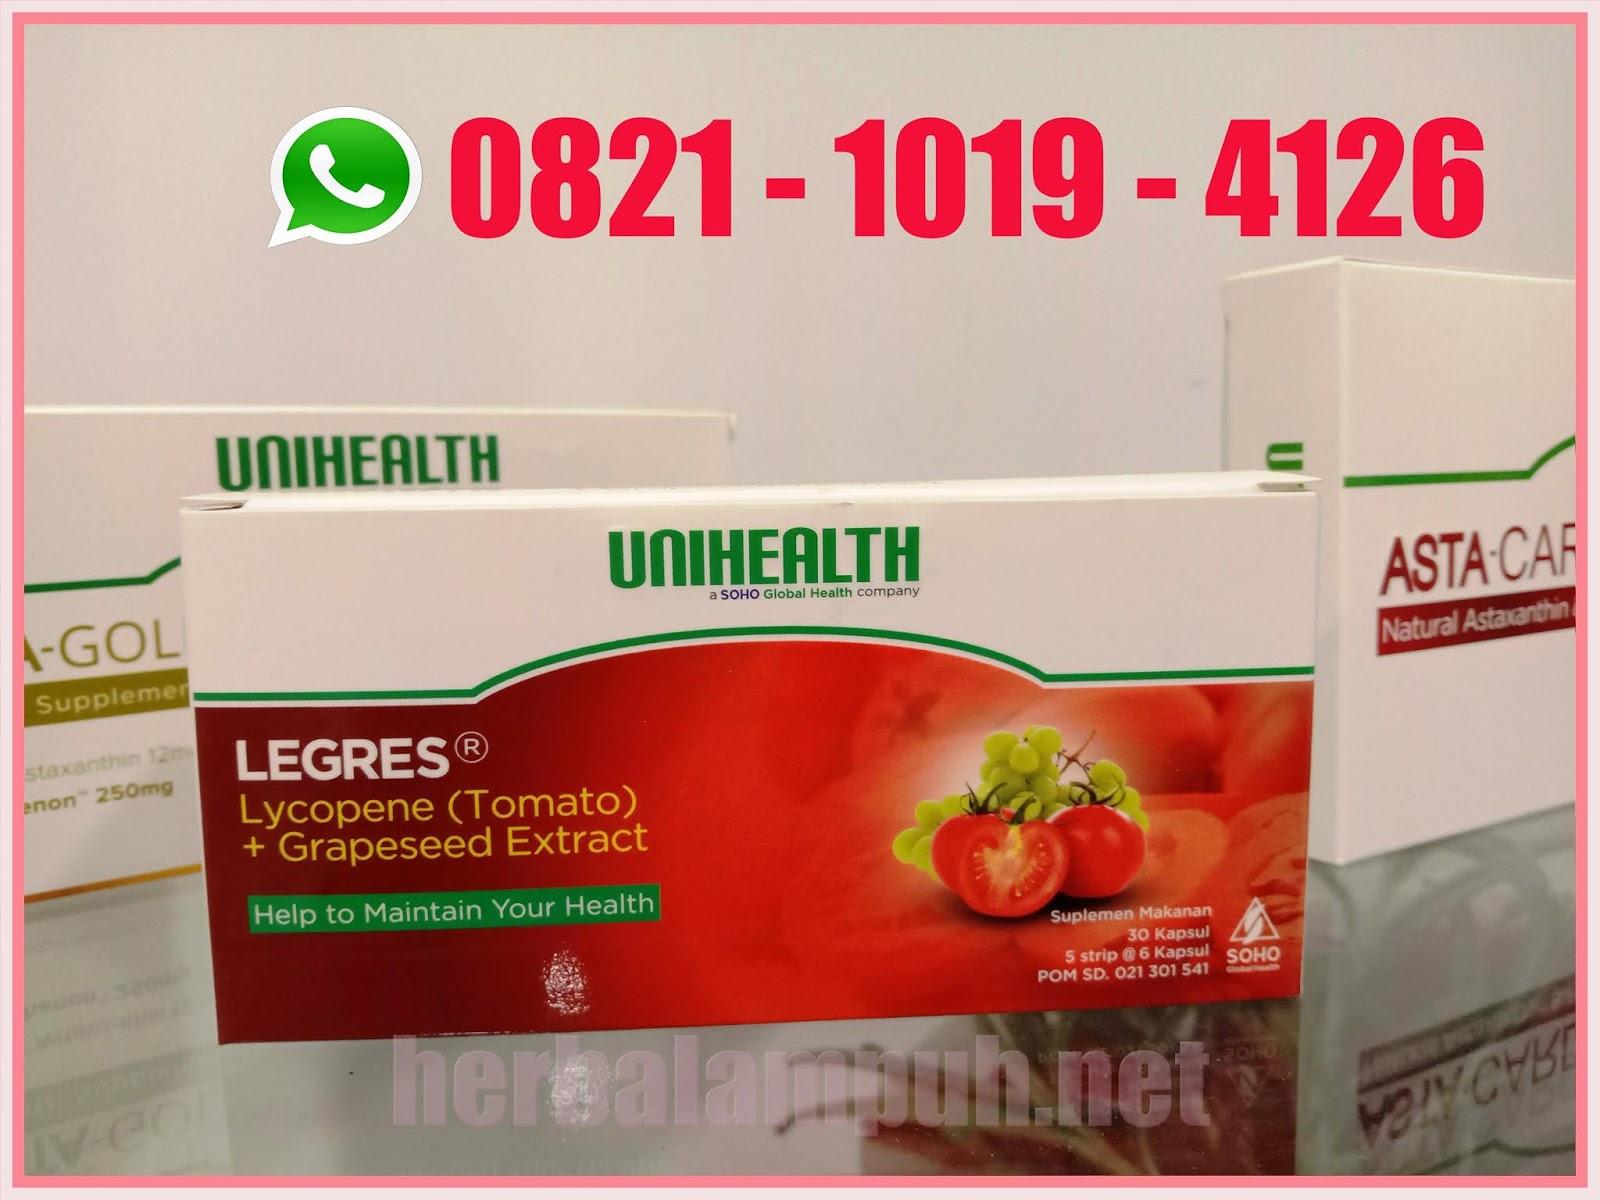 nutrasetikal fitokimia, nutrasetika farmasi, nutrasetikal untuk kesehatan kulit, nutrasetika untuk kesehatan wanita, nutrasetika sendi